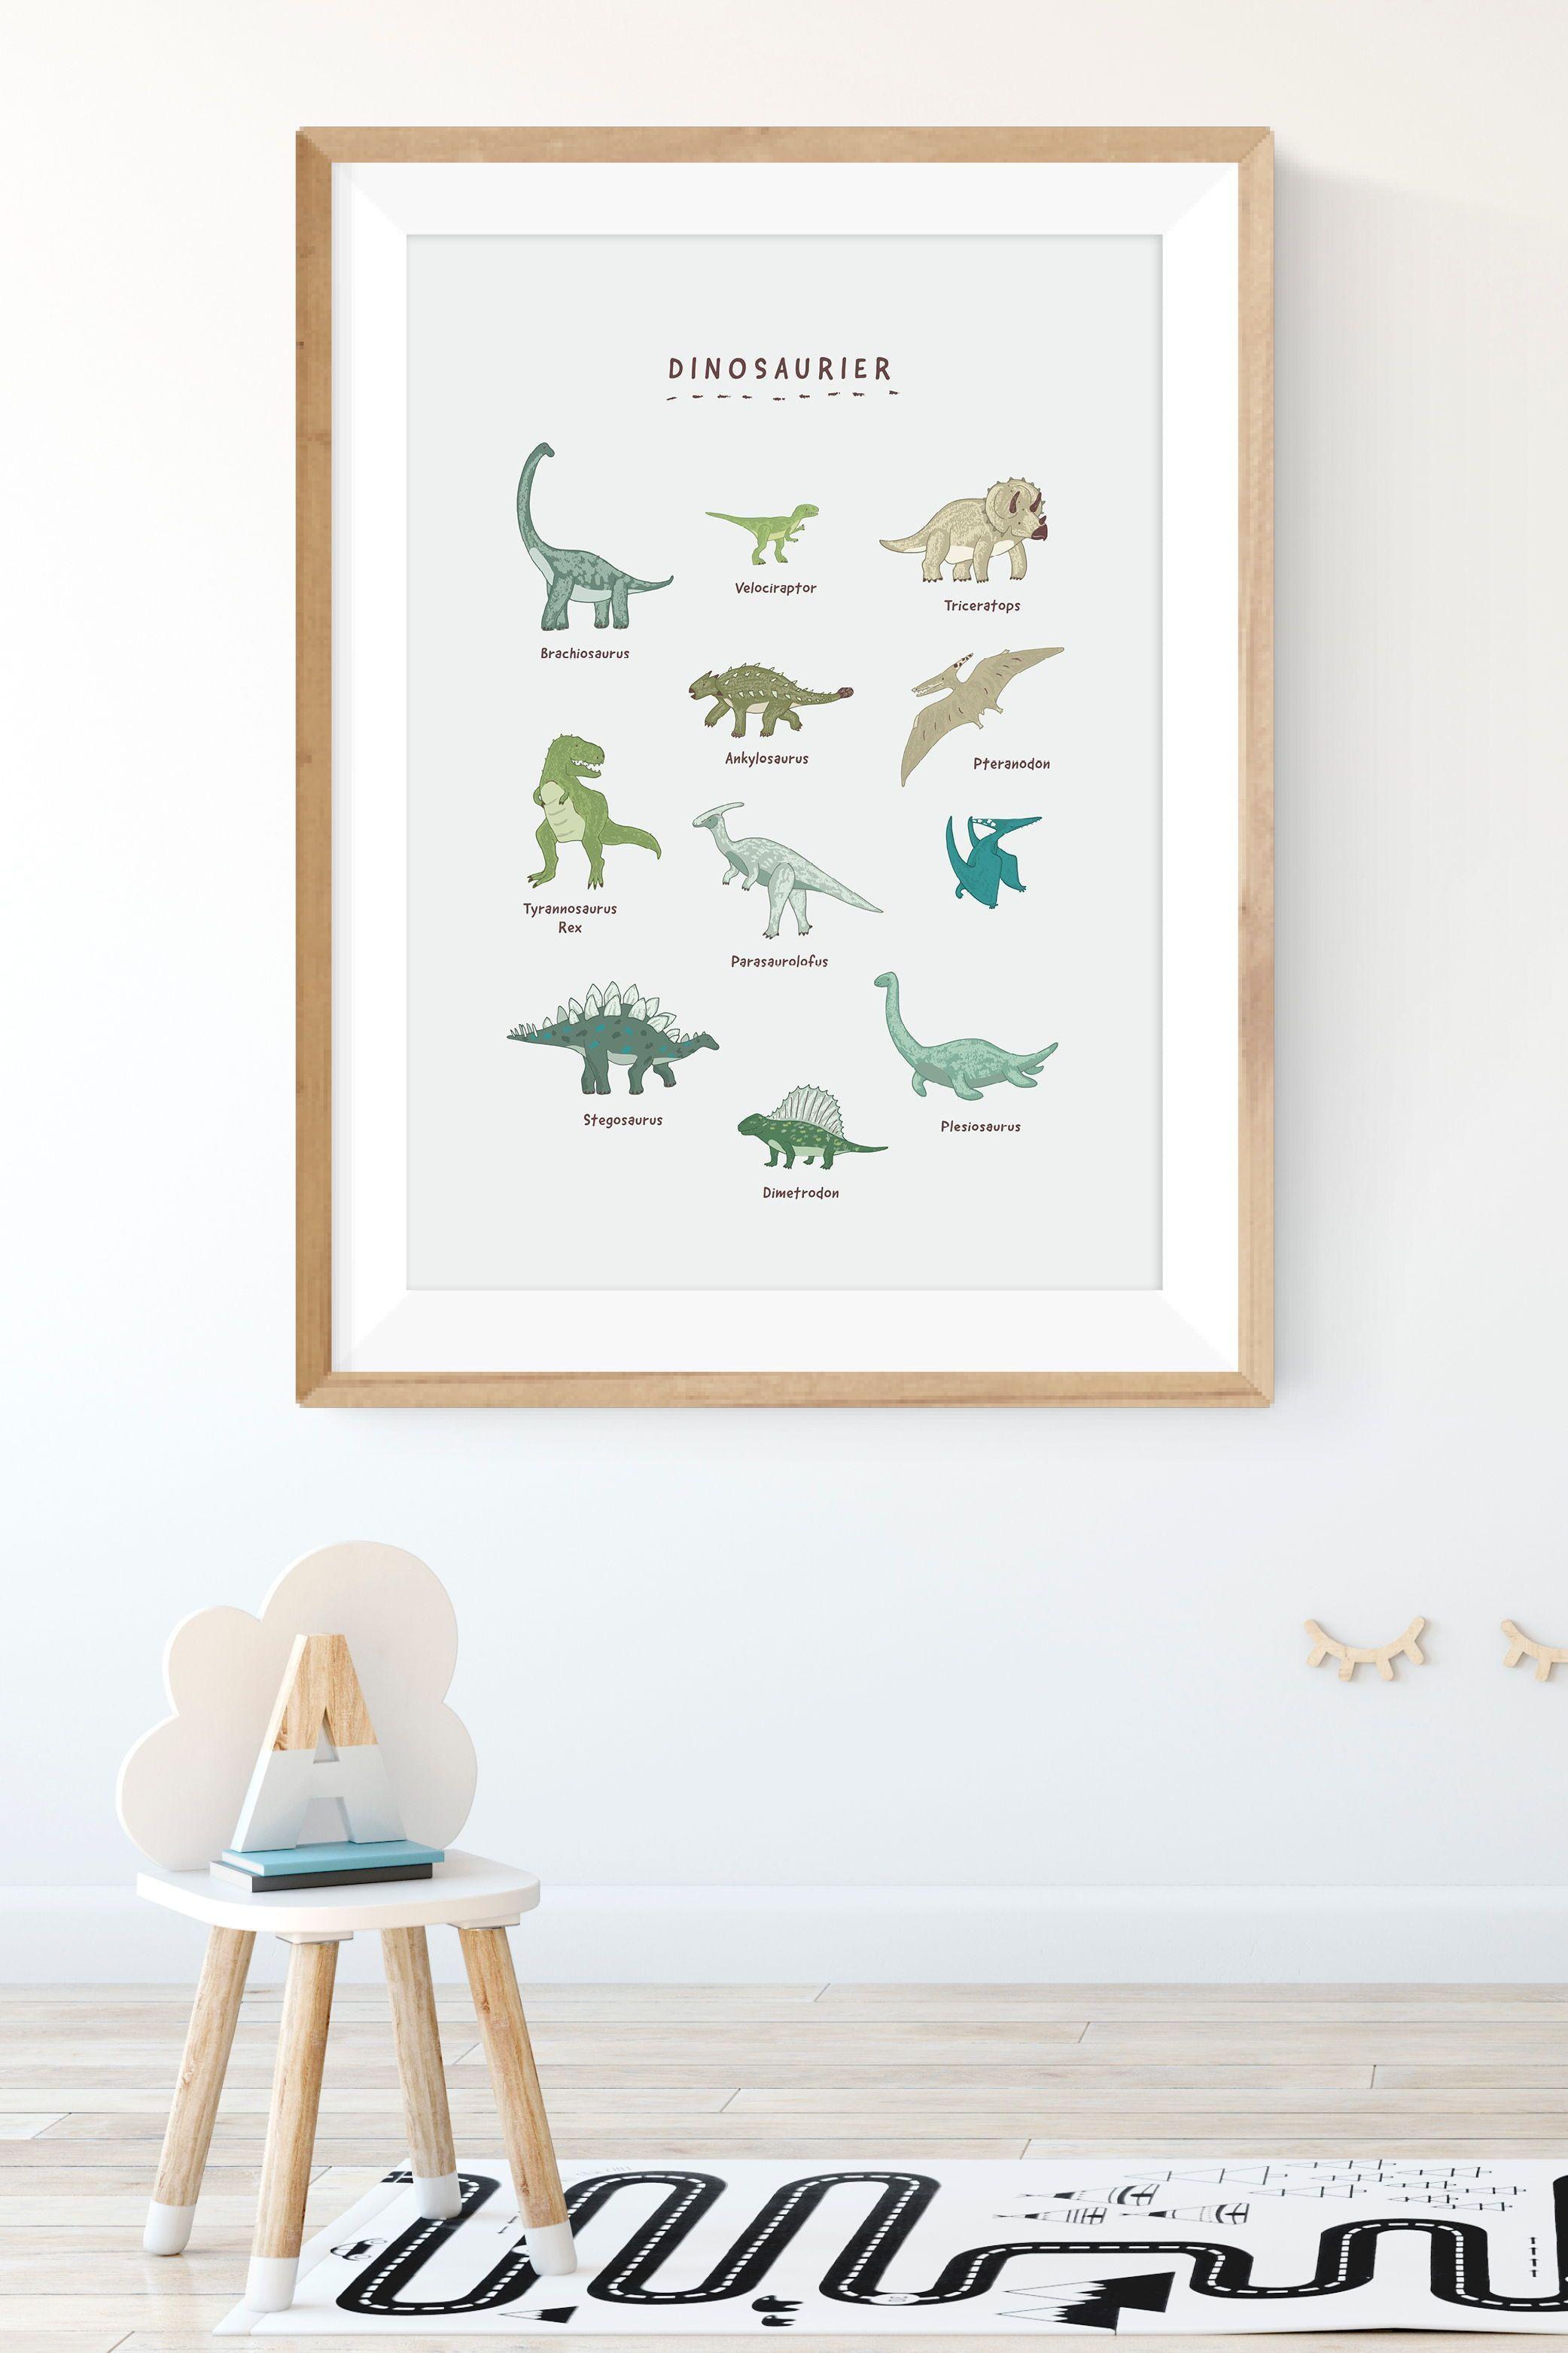 plakat dinosaurier din a2 poster kinderzimmer kinder zimmer design fur silberner hirschkopf deko wanddekoration hirsch